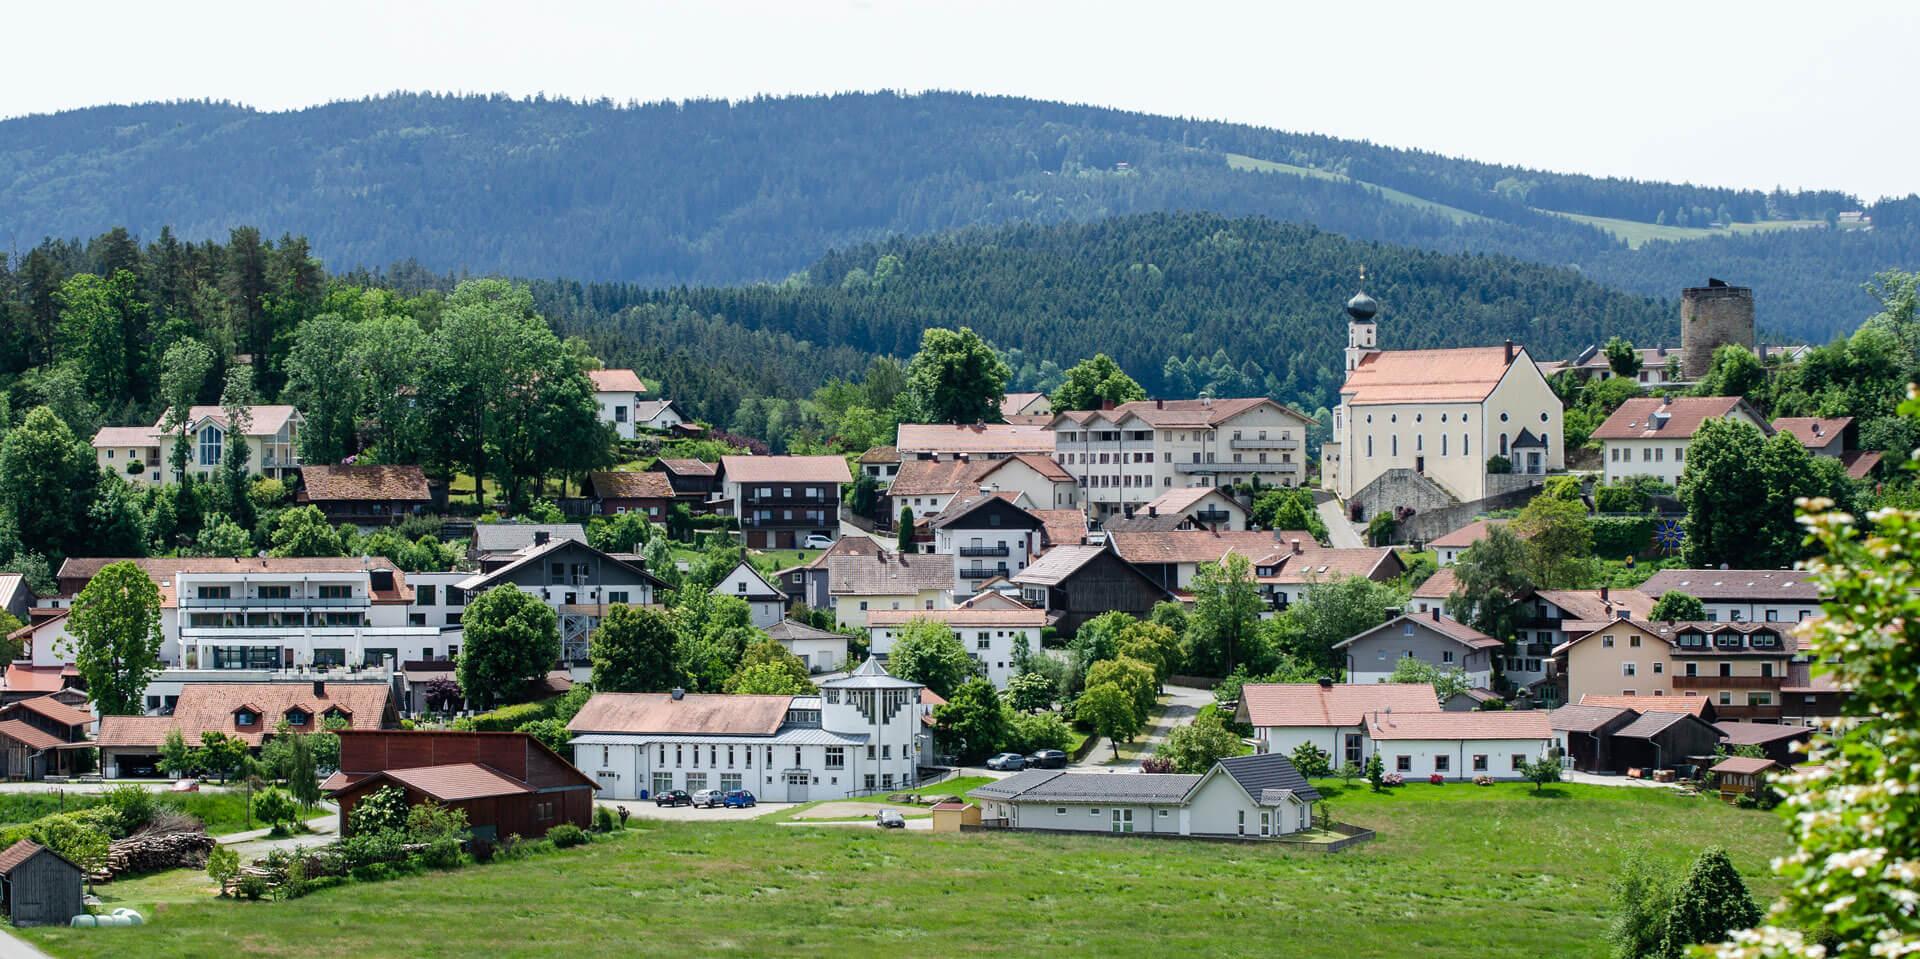 Obstgarten-0024.jpg